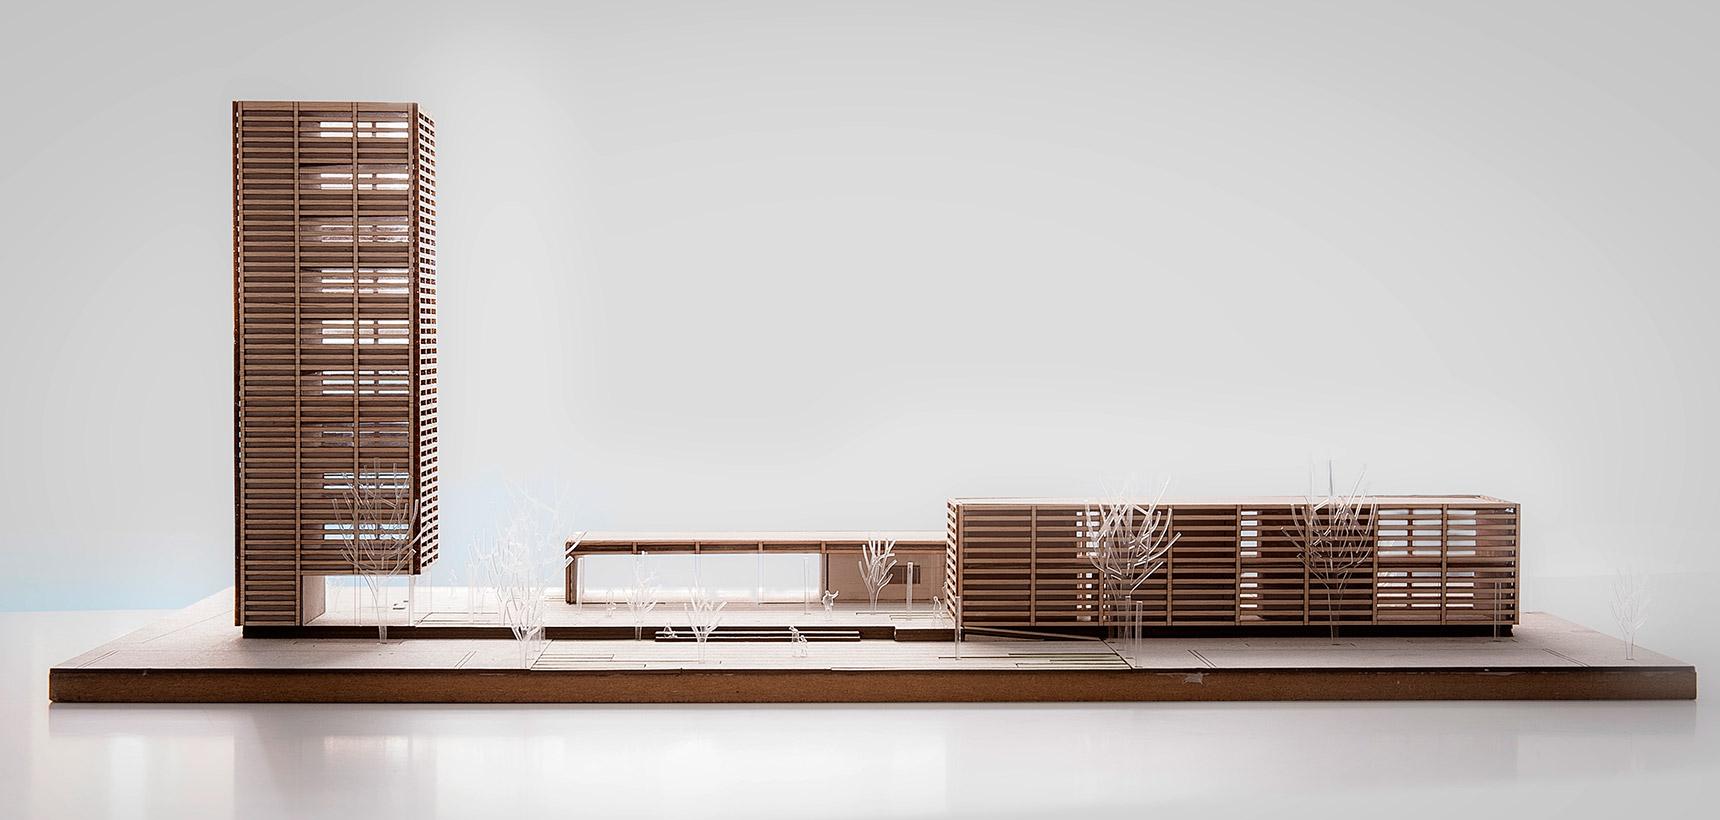 maqueta-arquitectura-valencia-pfc-tfg-UPV-huerta-grande-arquiayuda (2)